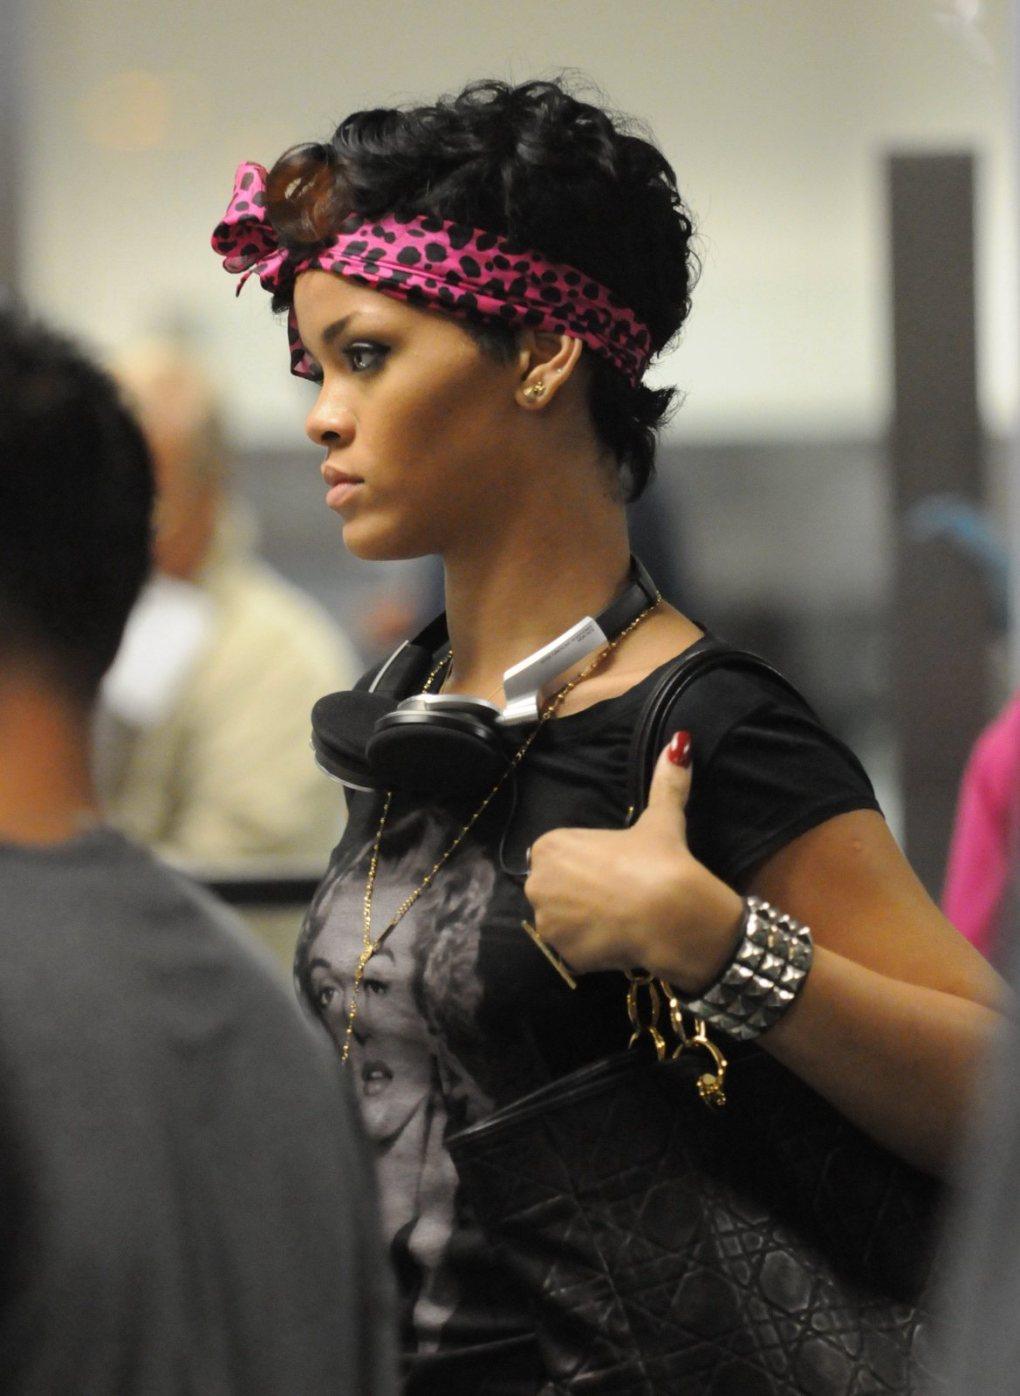 rihanna avec un bandeau rose